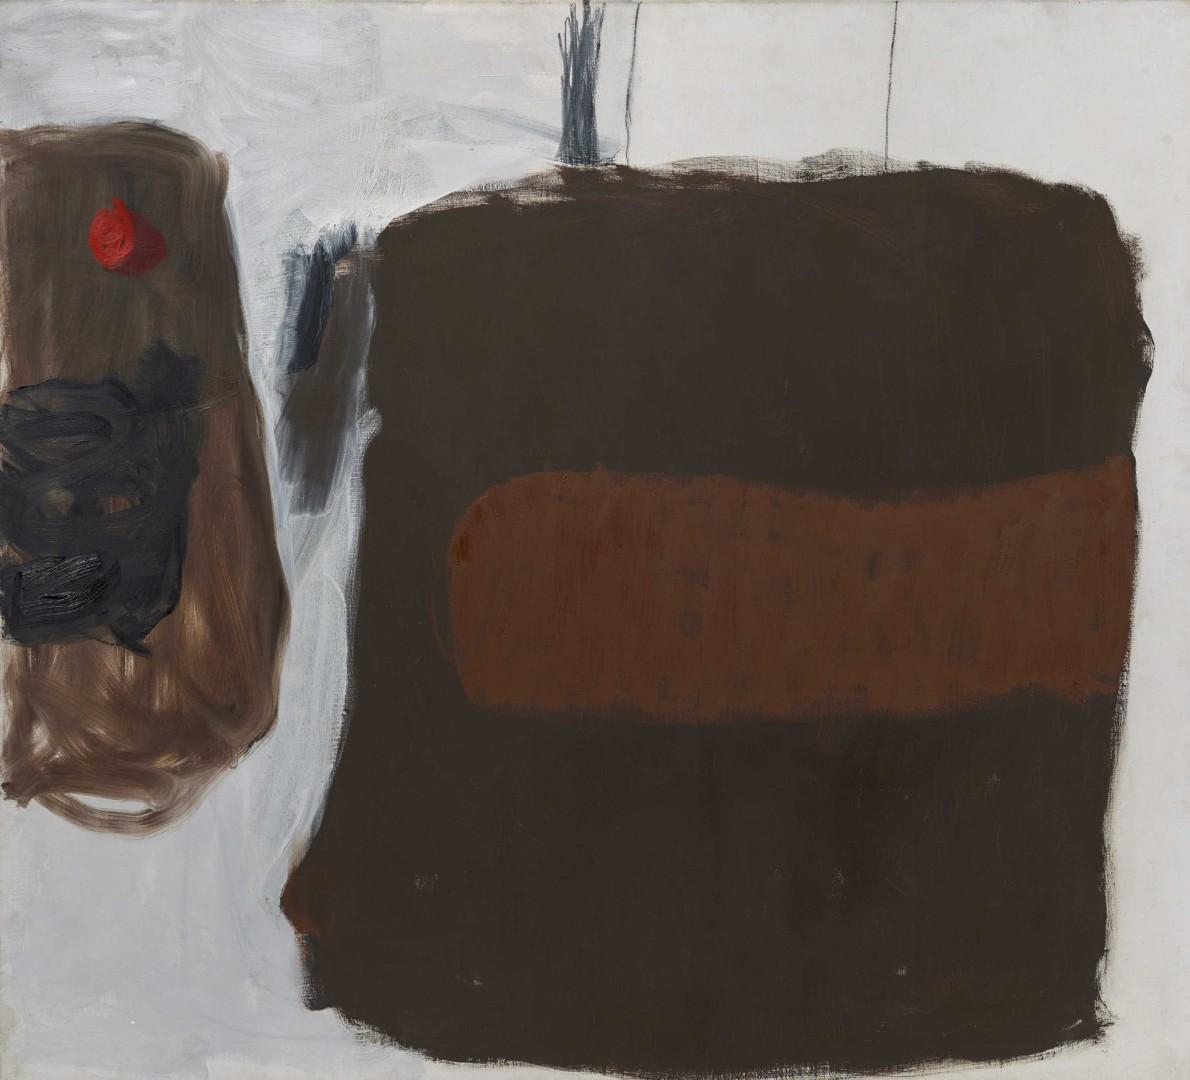 Roger Hilton, Untitled, 1962